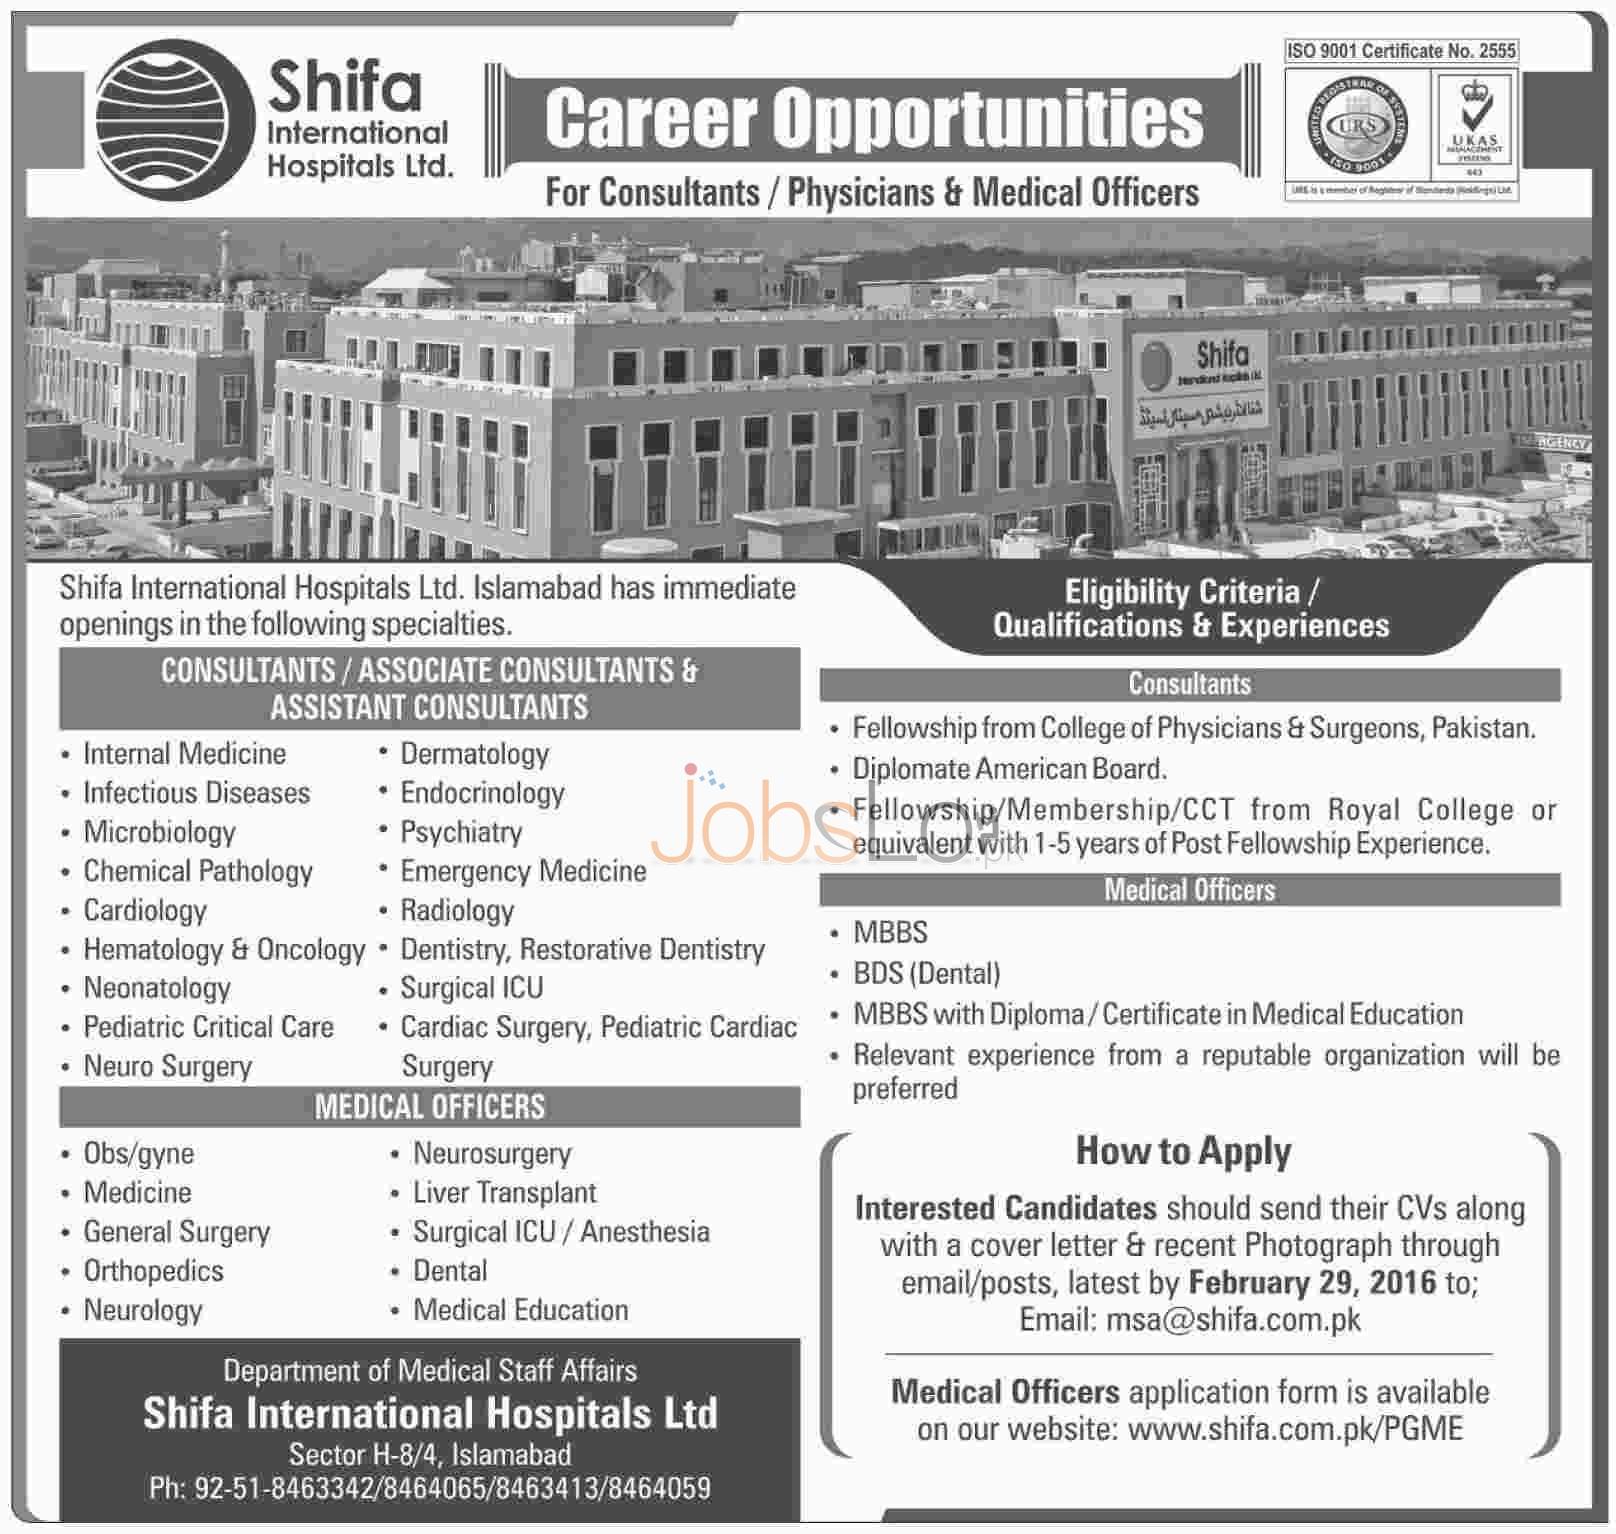 Shifa International Hospital February 2016 Islamabad Recruitment Offers